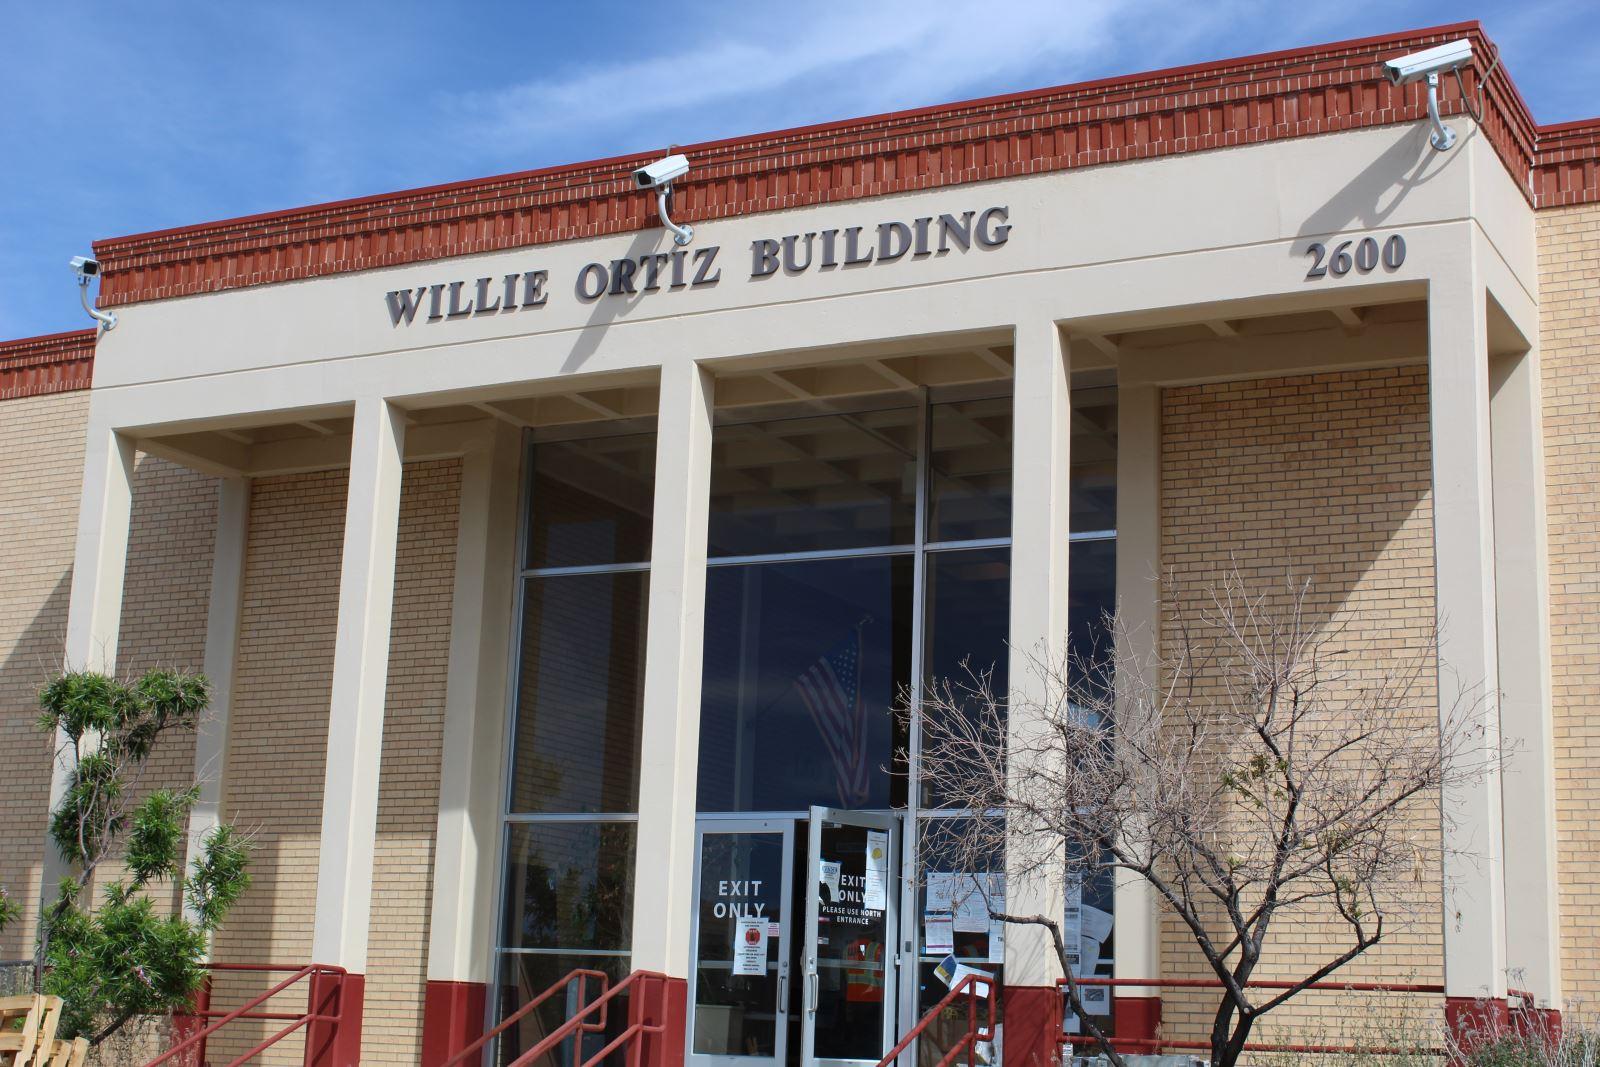 Willie Ortiz Building